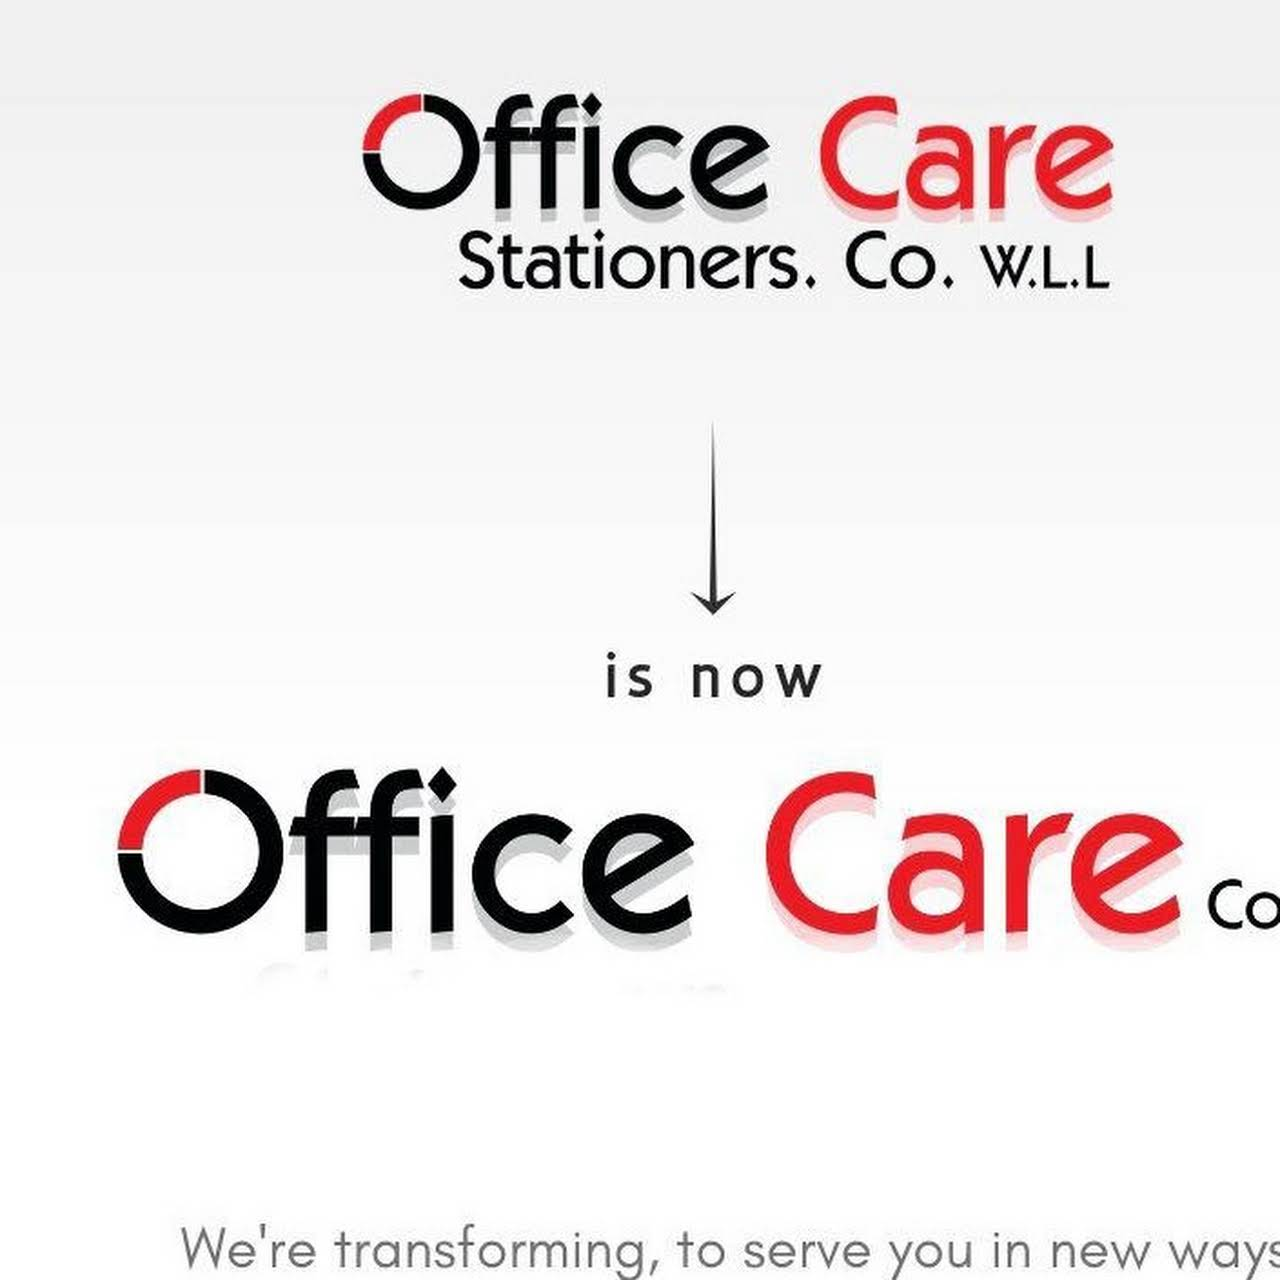 Office Care Co  W L L - Leading Supplier of School & Office